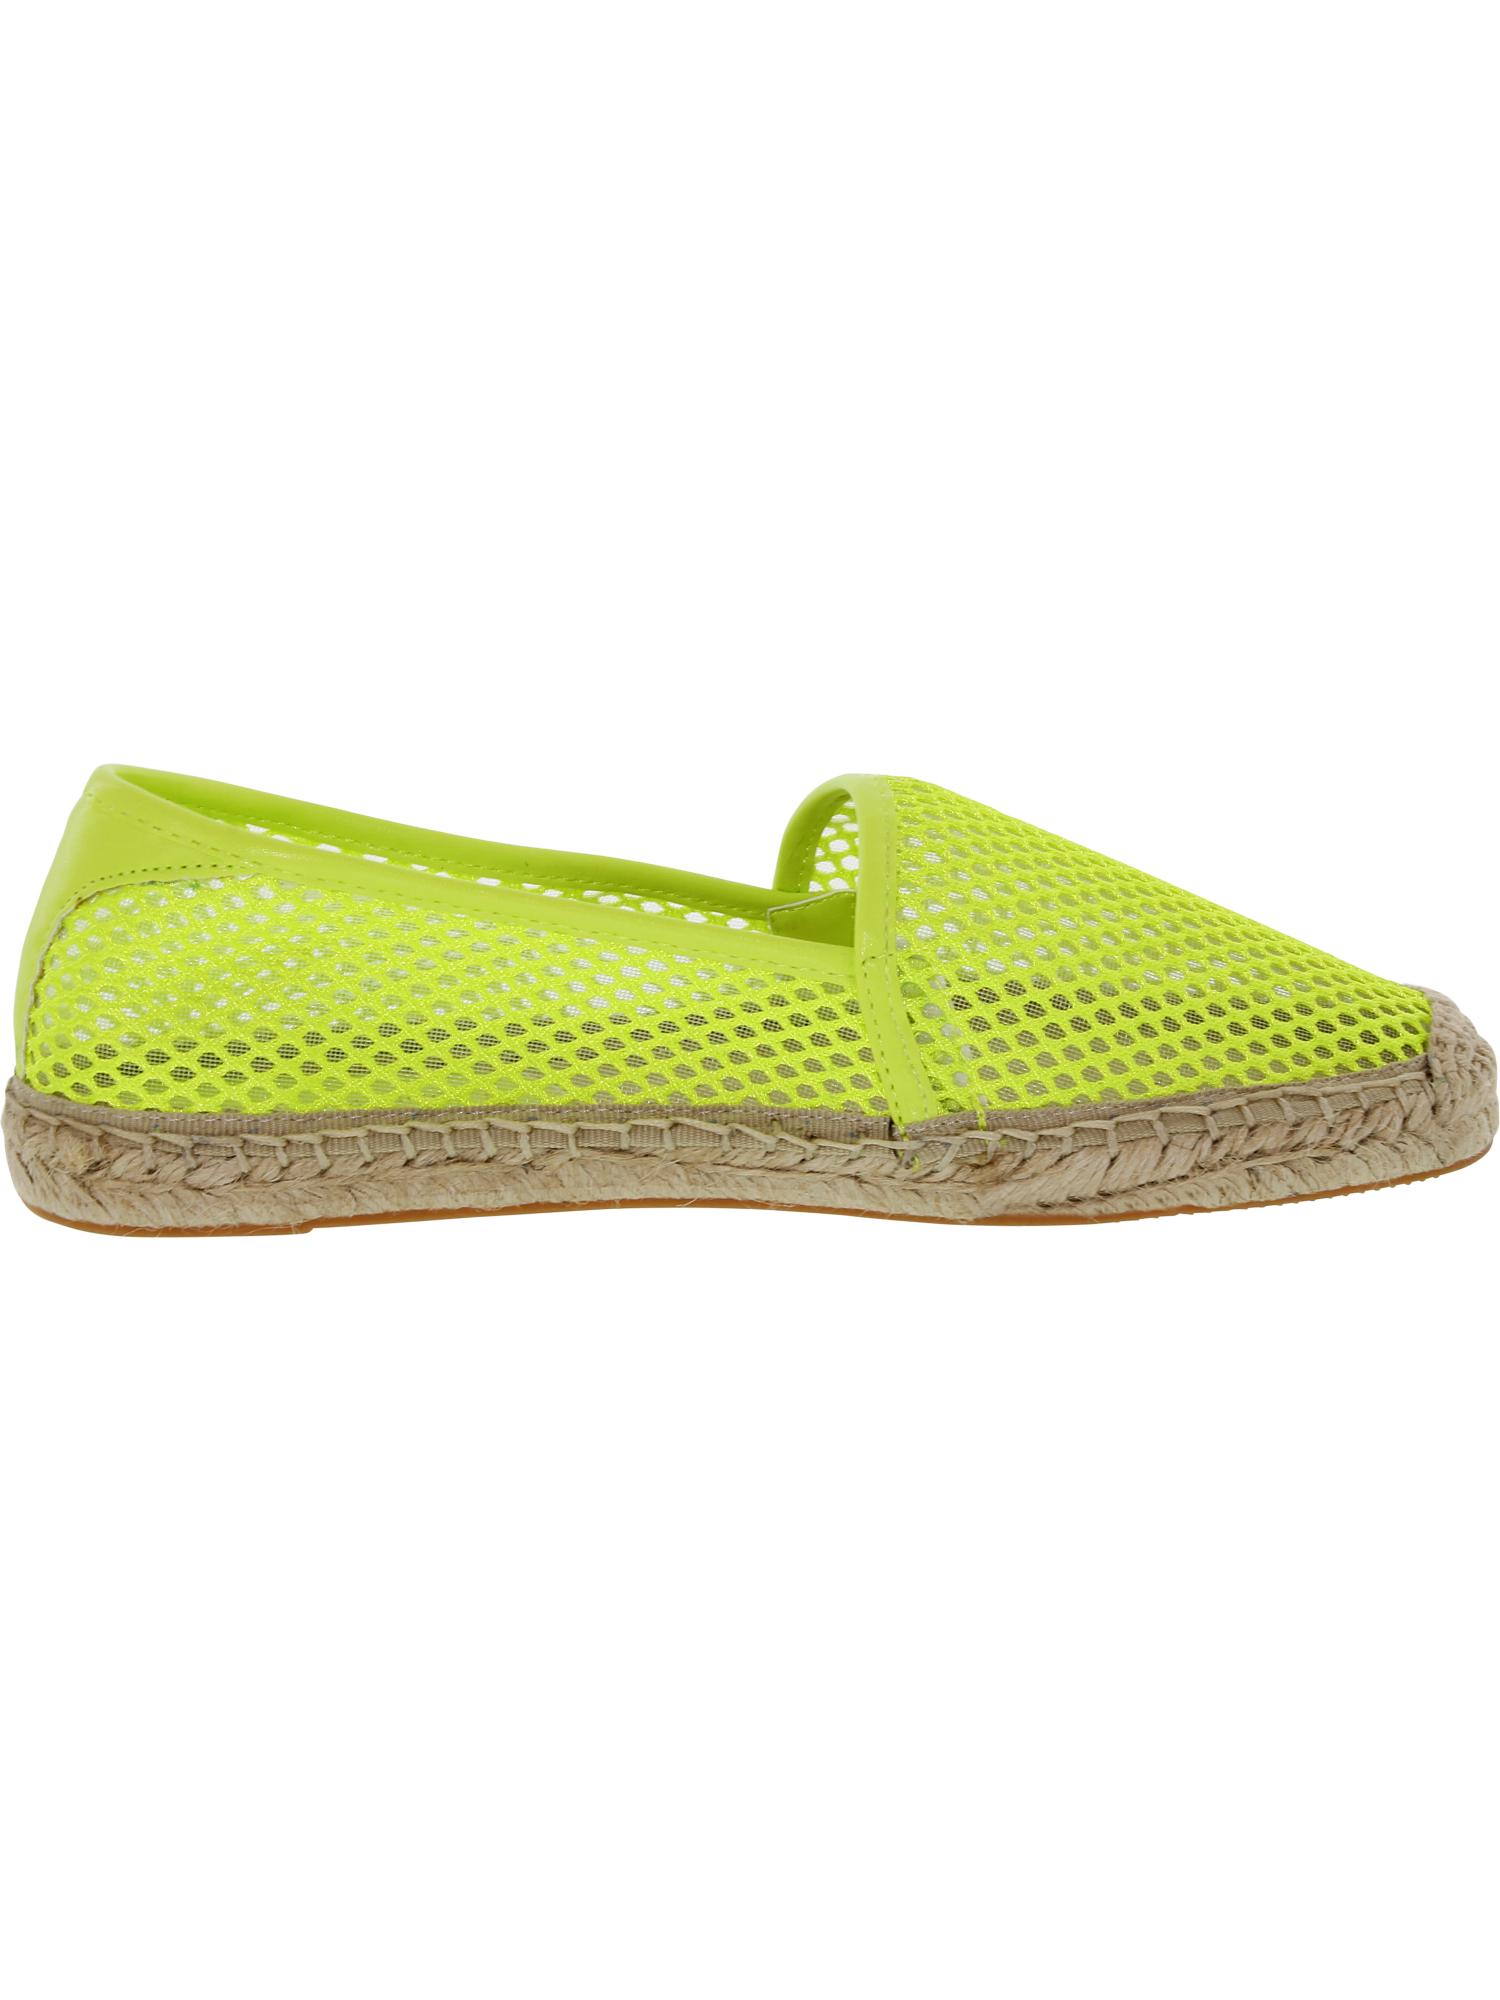 Rebecca-Minkoff-Women-039-s-Ginny-Ankle-High-Mesh-Slip-On-Shoes thumbnail 5